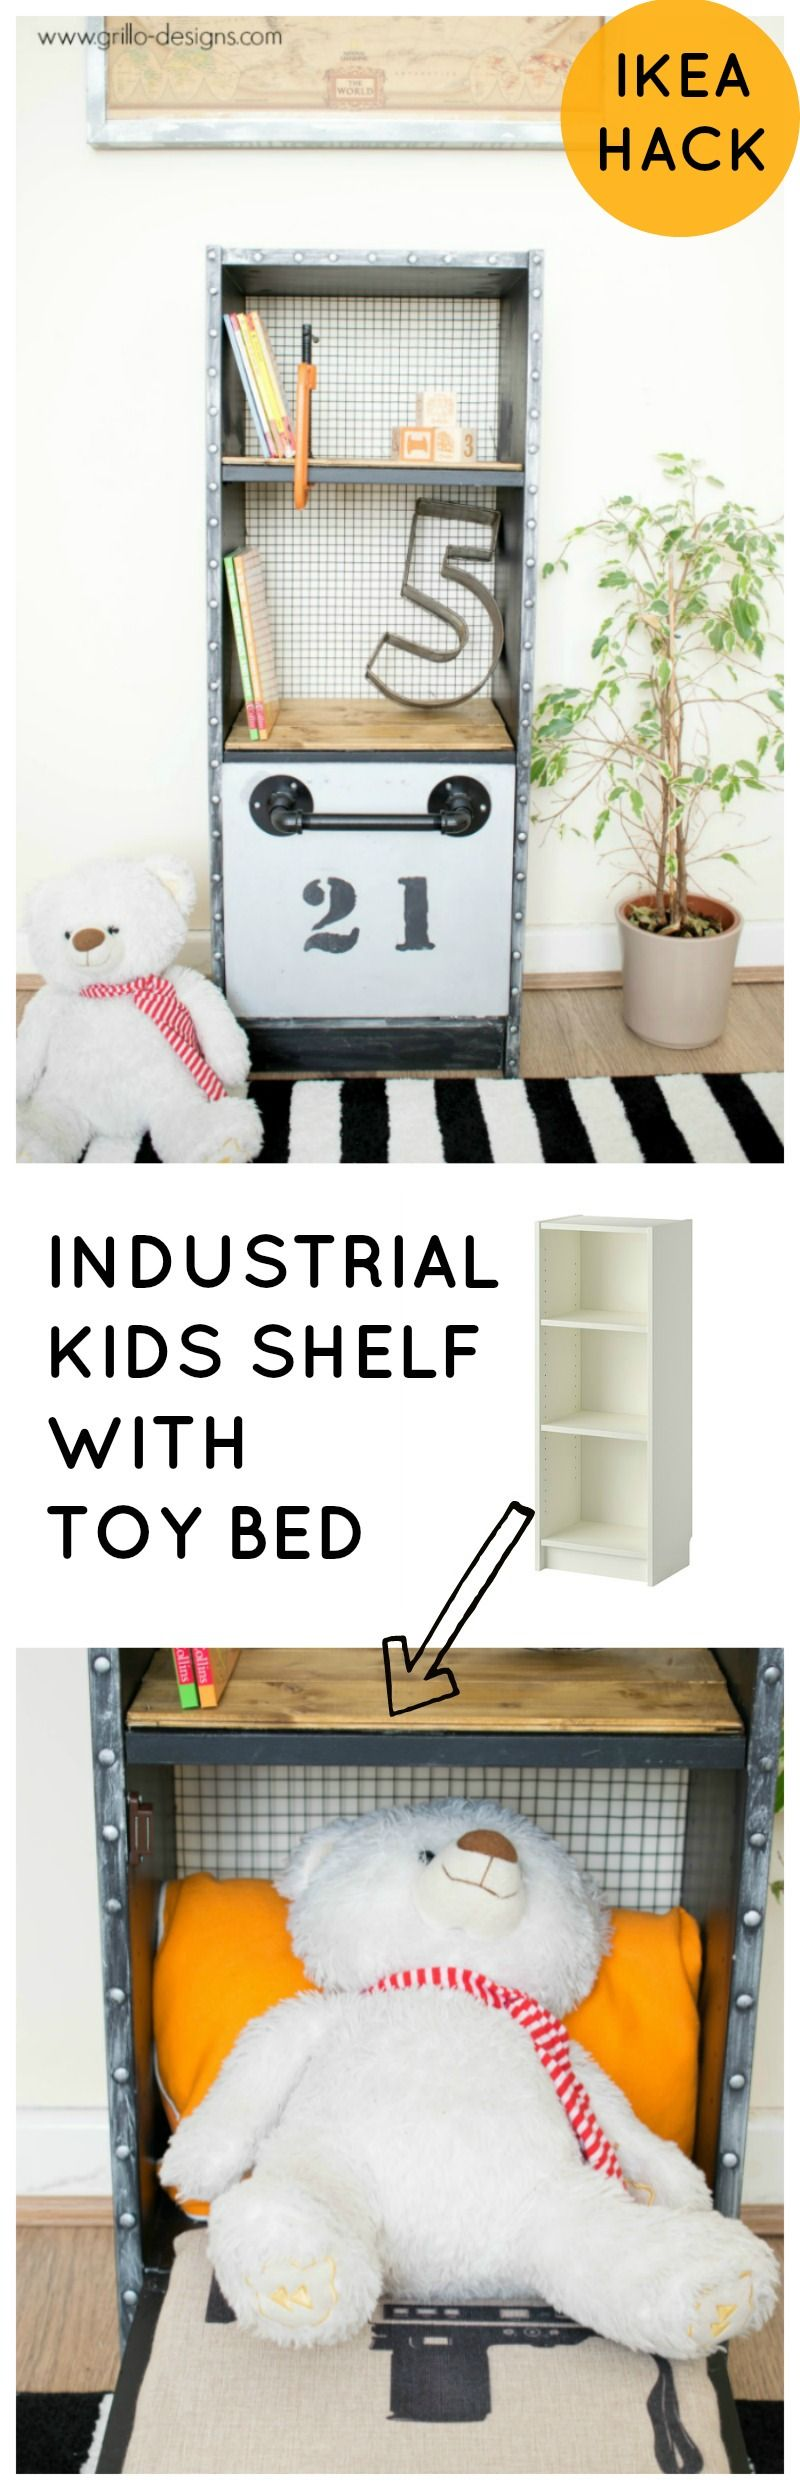 IKEA HACK INDUSTRIAL KIDS SHELF WITH TOY BED Diy kids